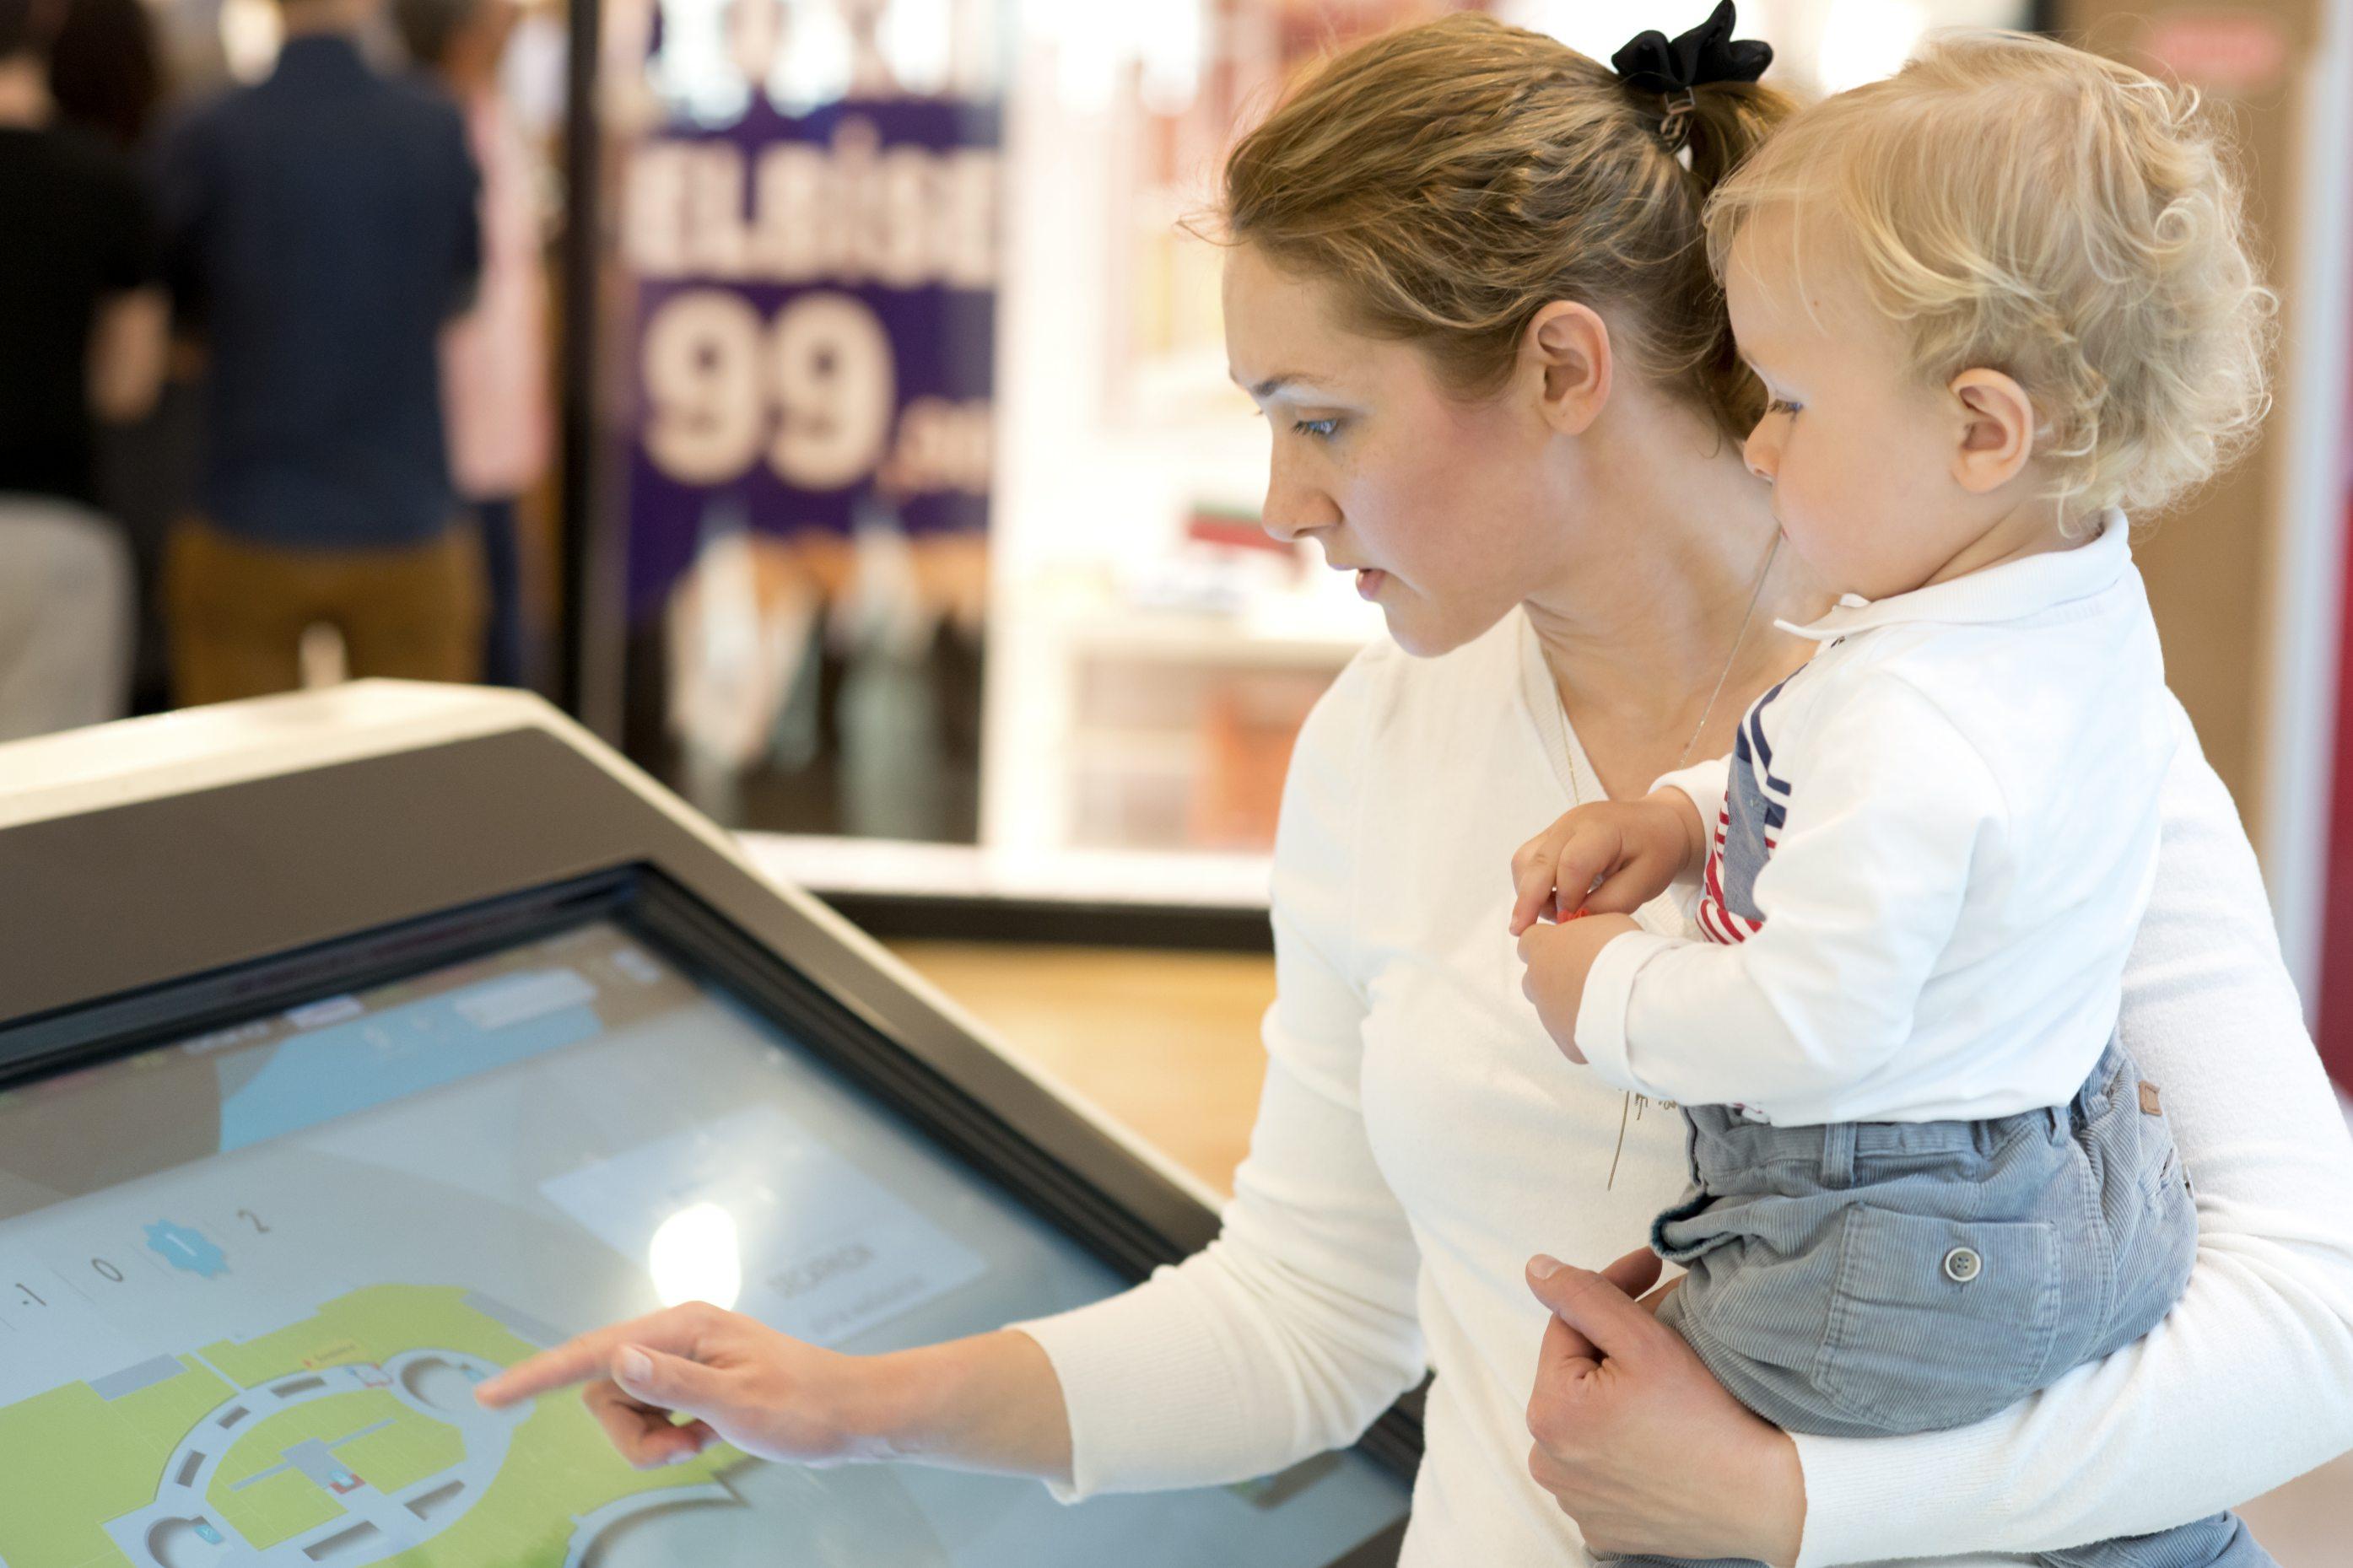 Kiosk and Self Service